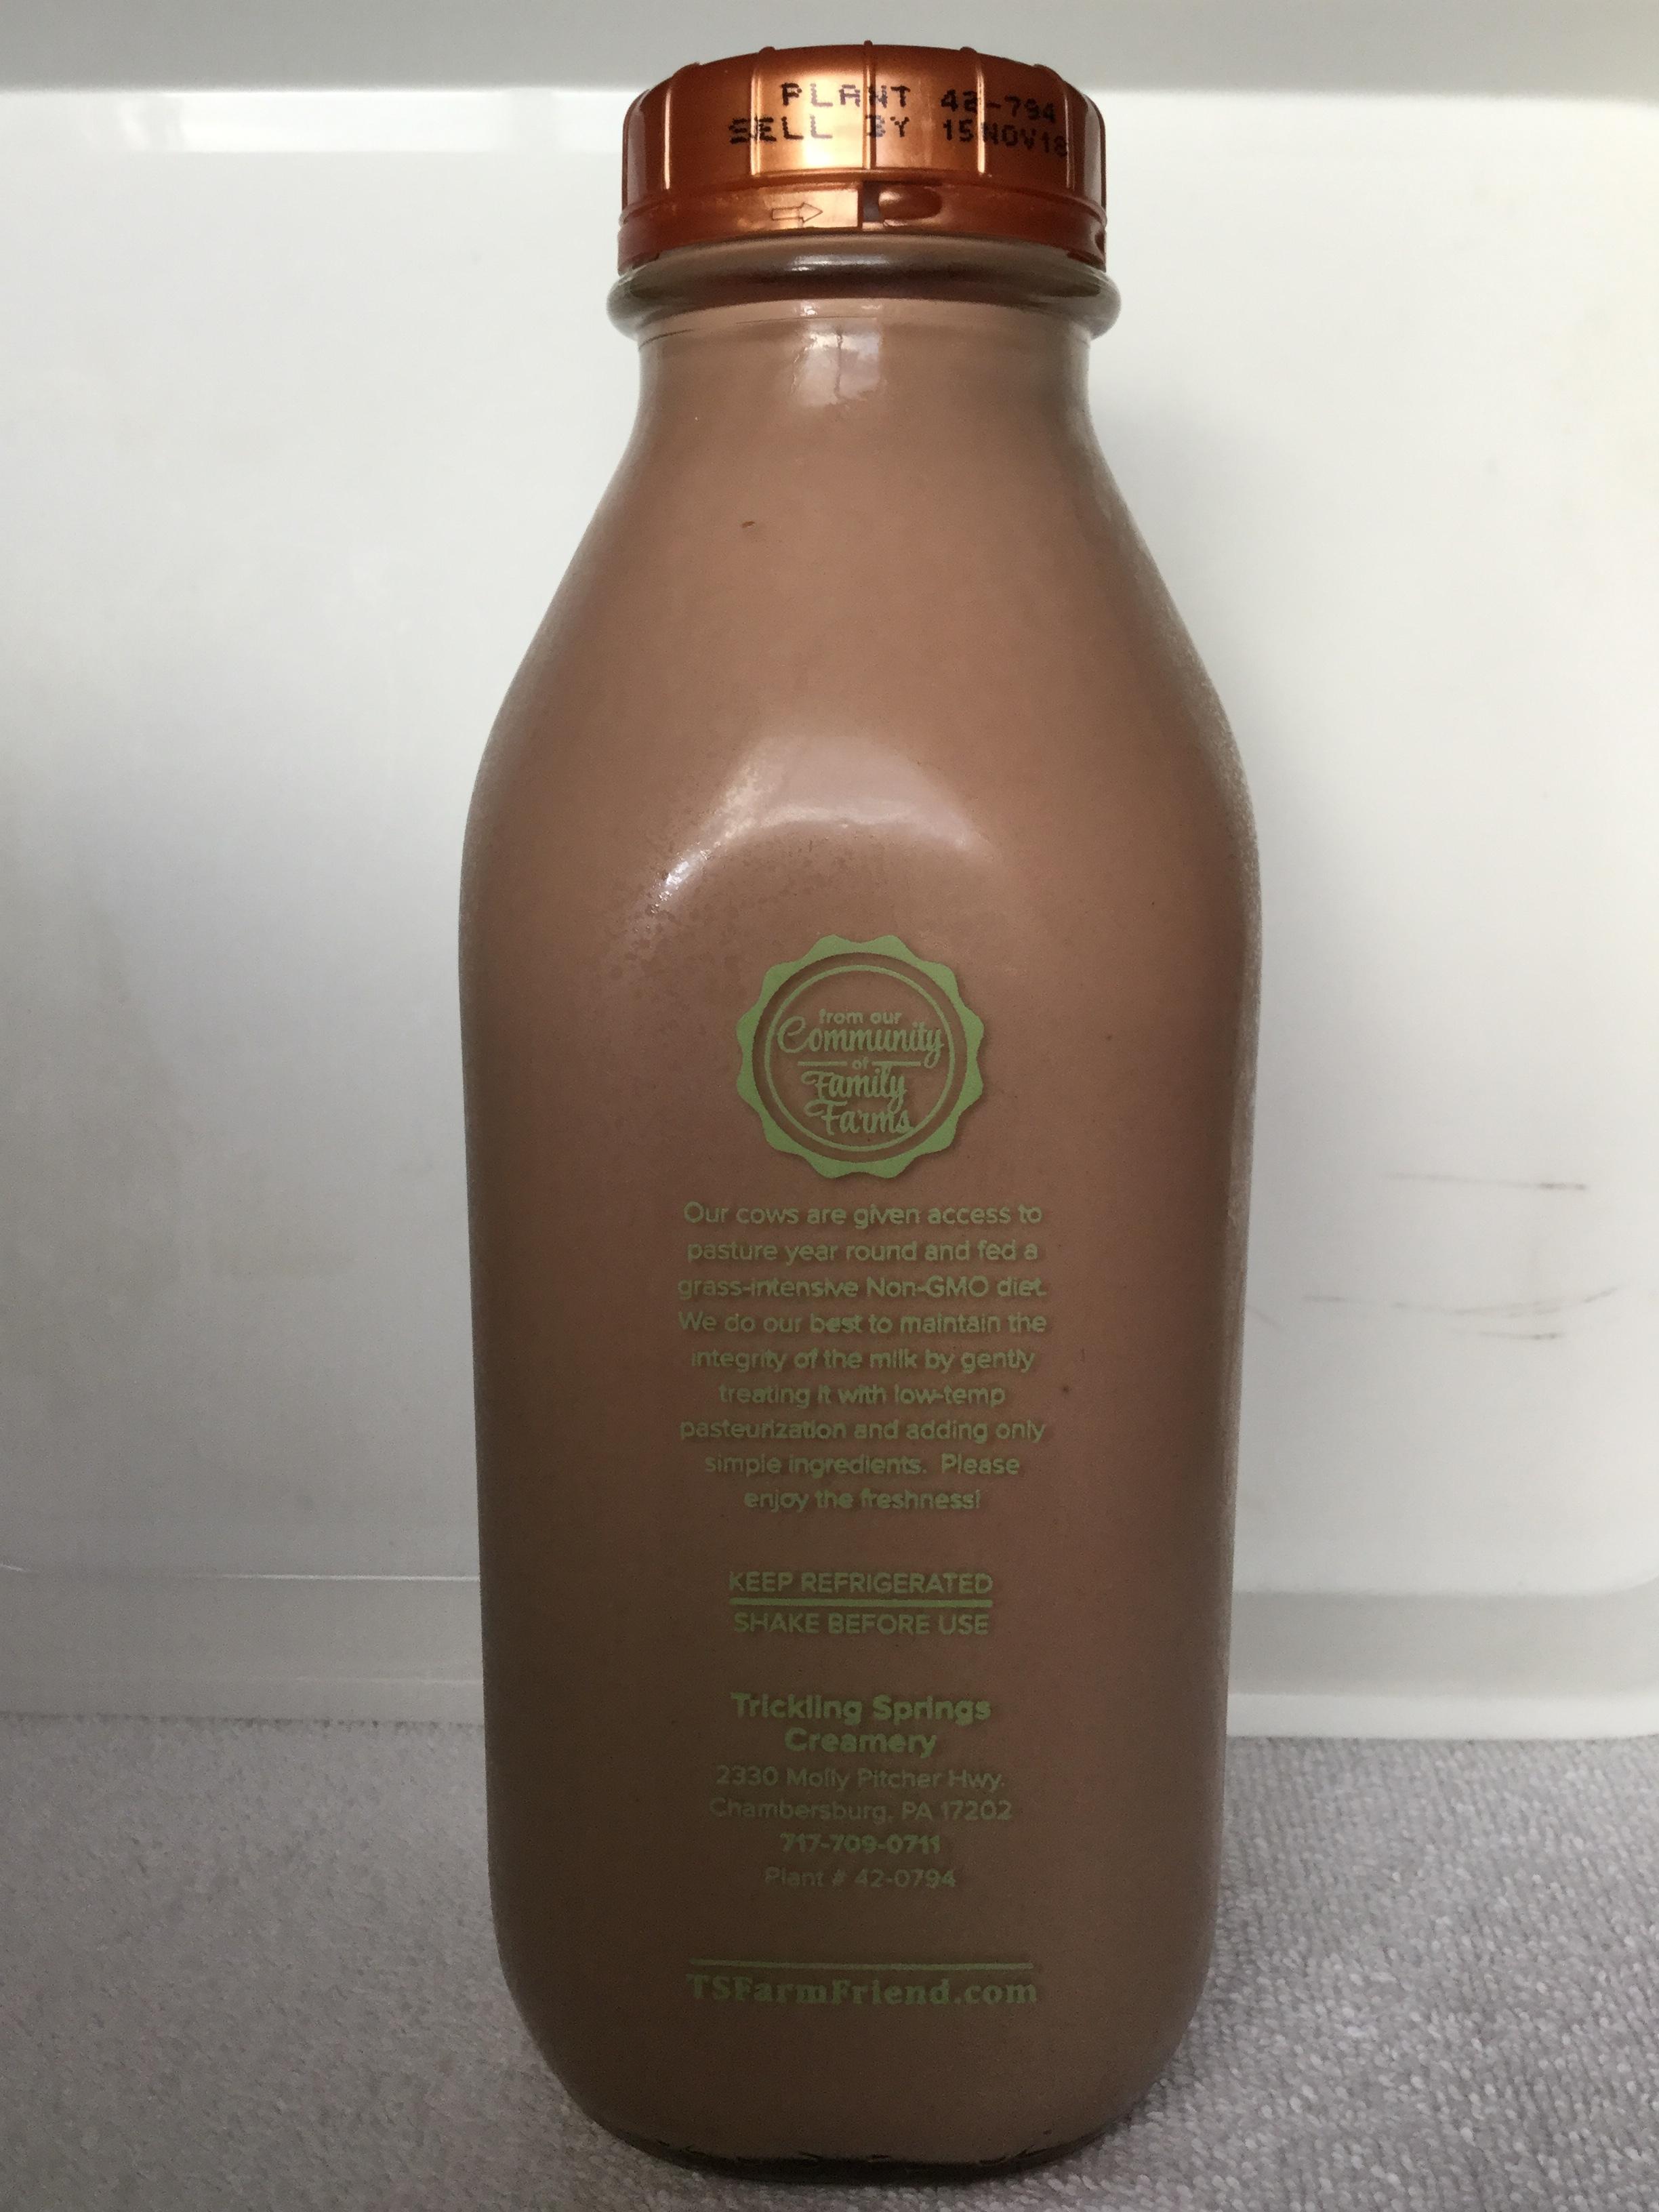 Trickling Springs FarmFriend Chocolate Milk Side 1